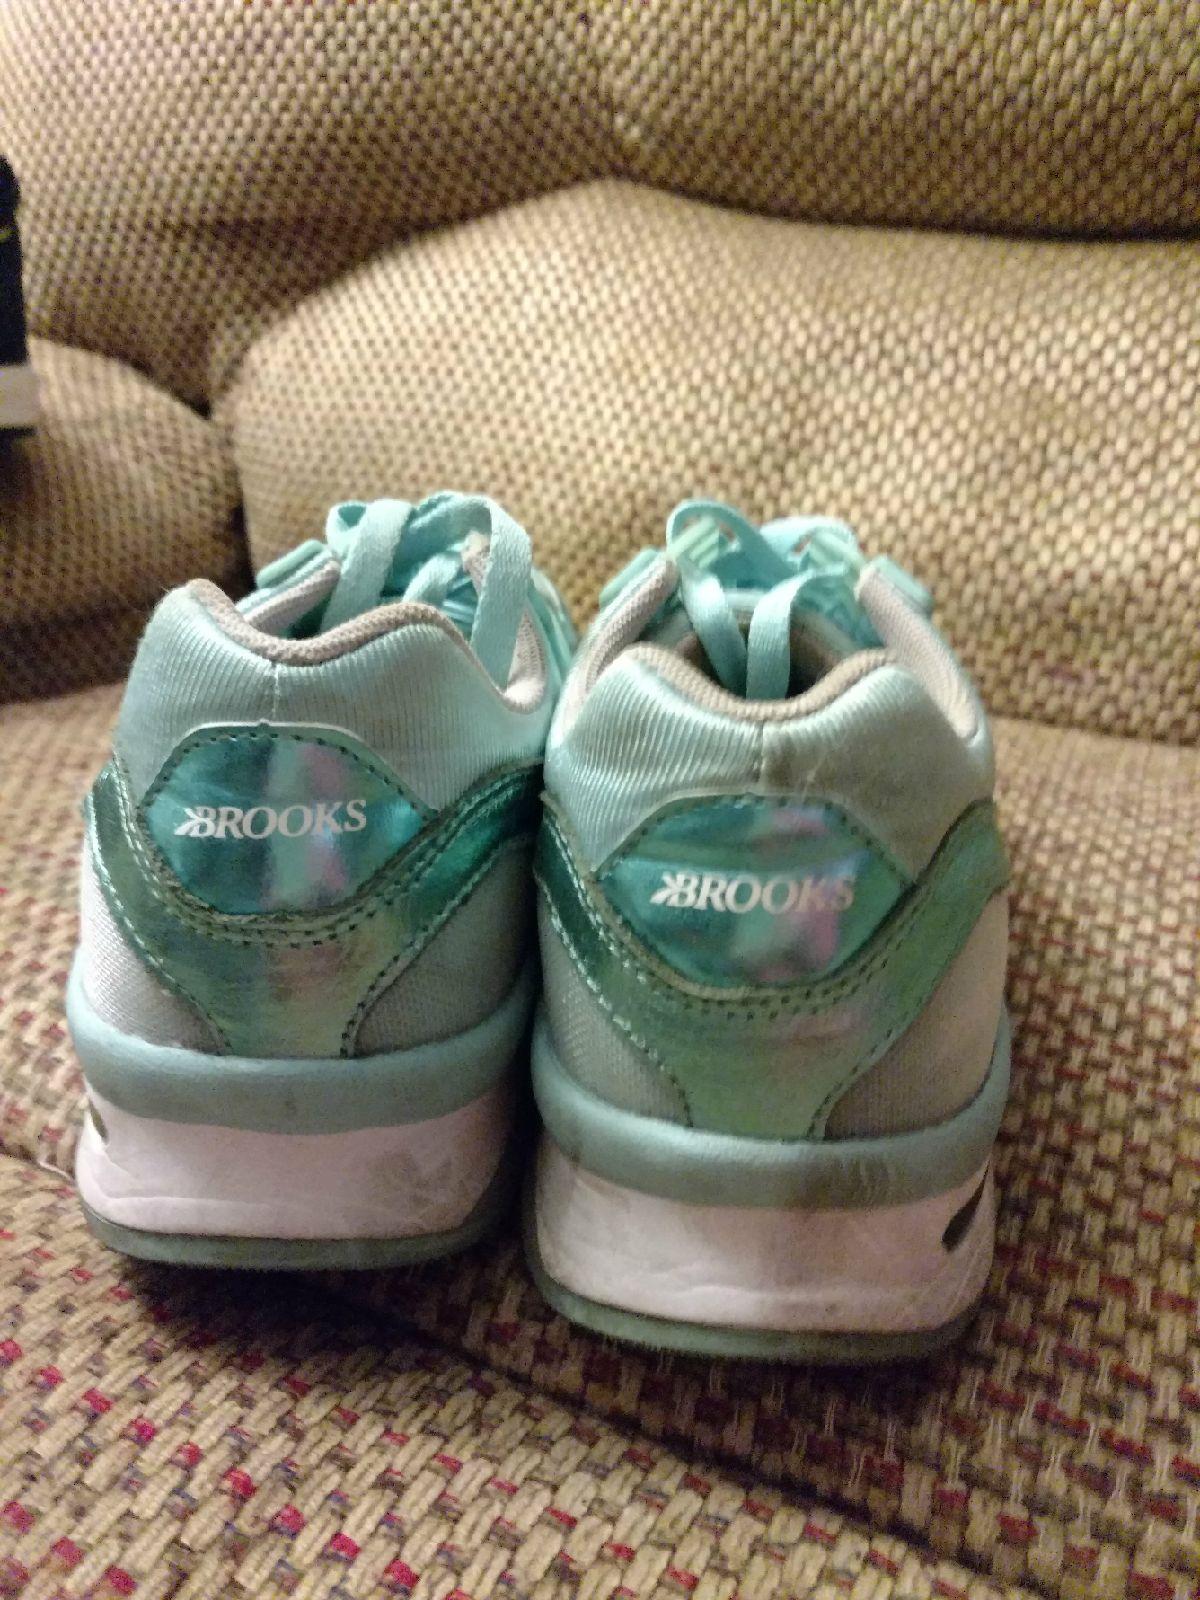 336213c972ab1 Brooks tennis shoes size 9 - Mercari  The Selling App